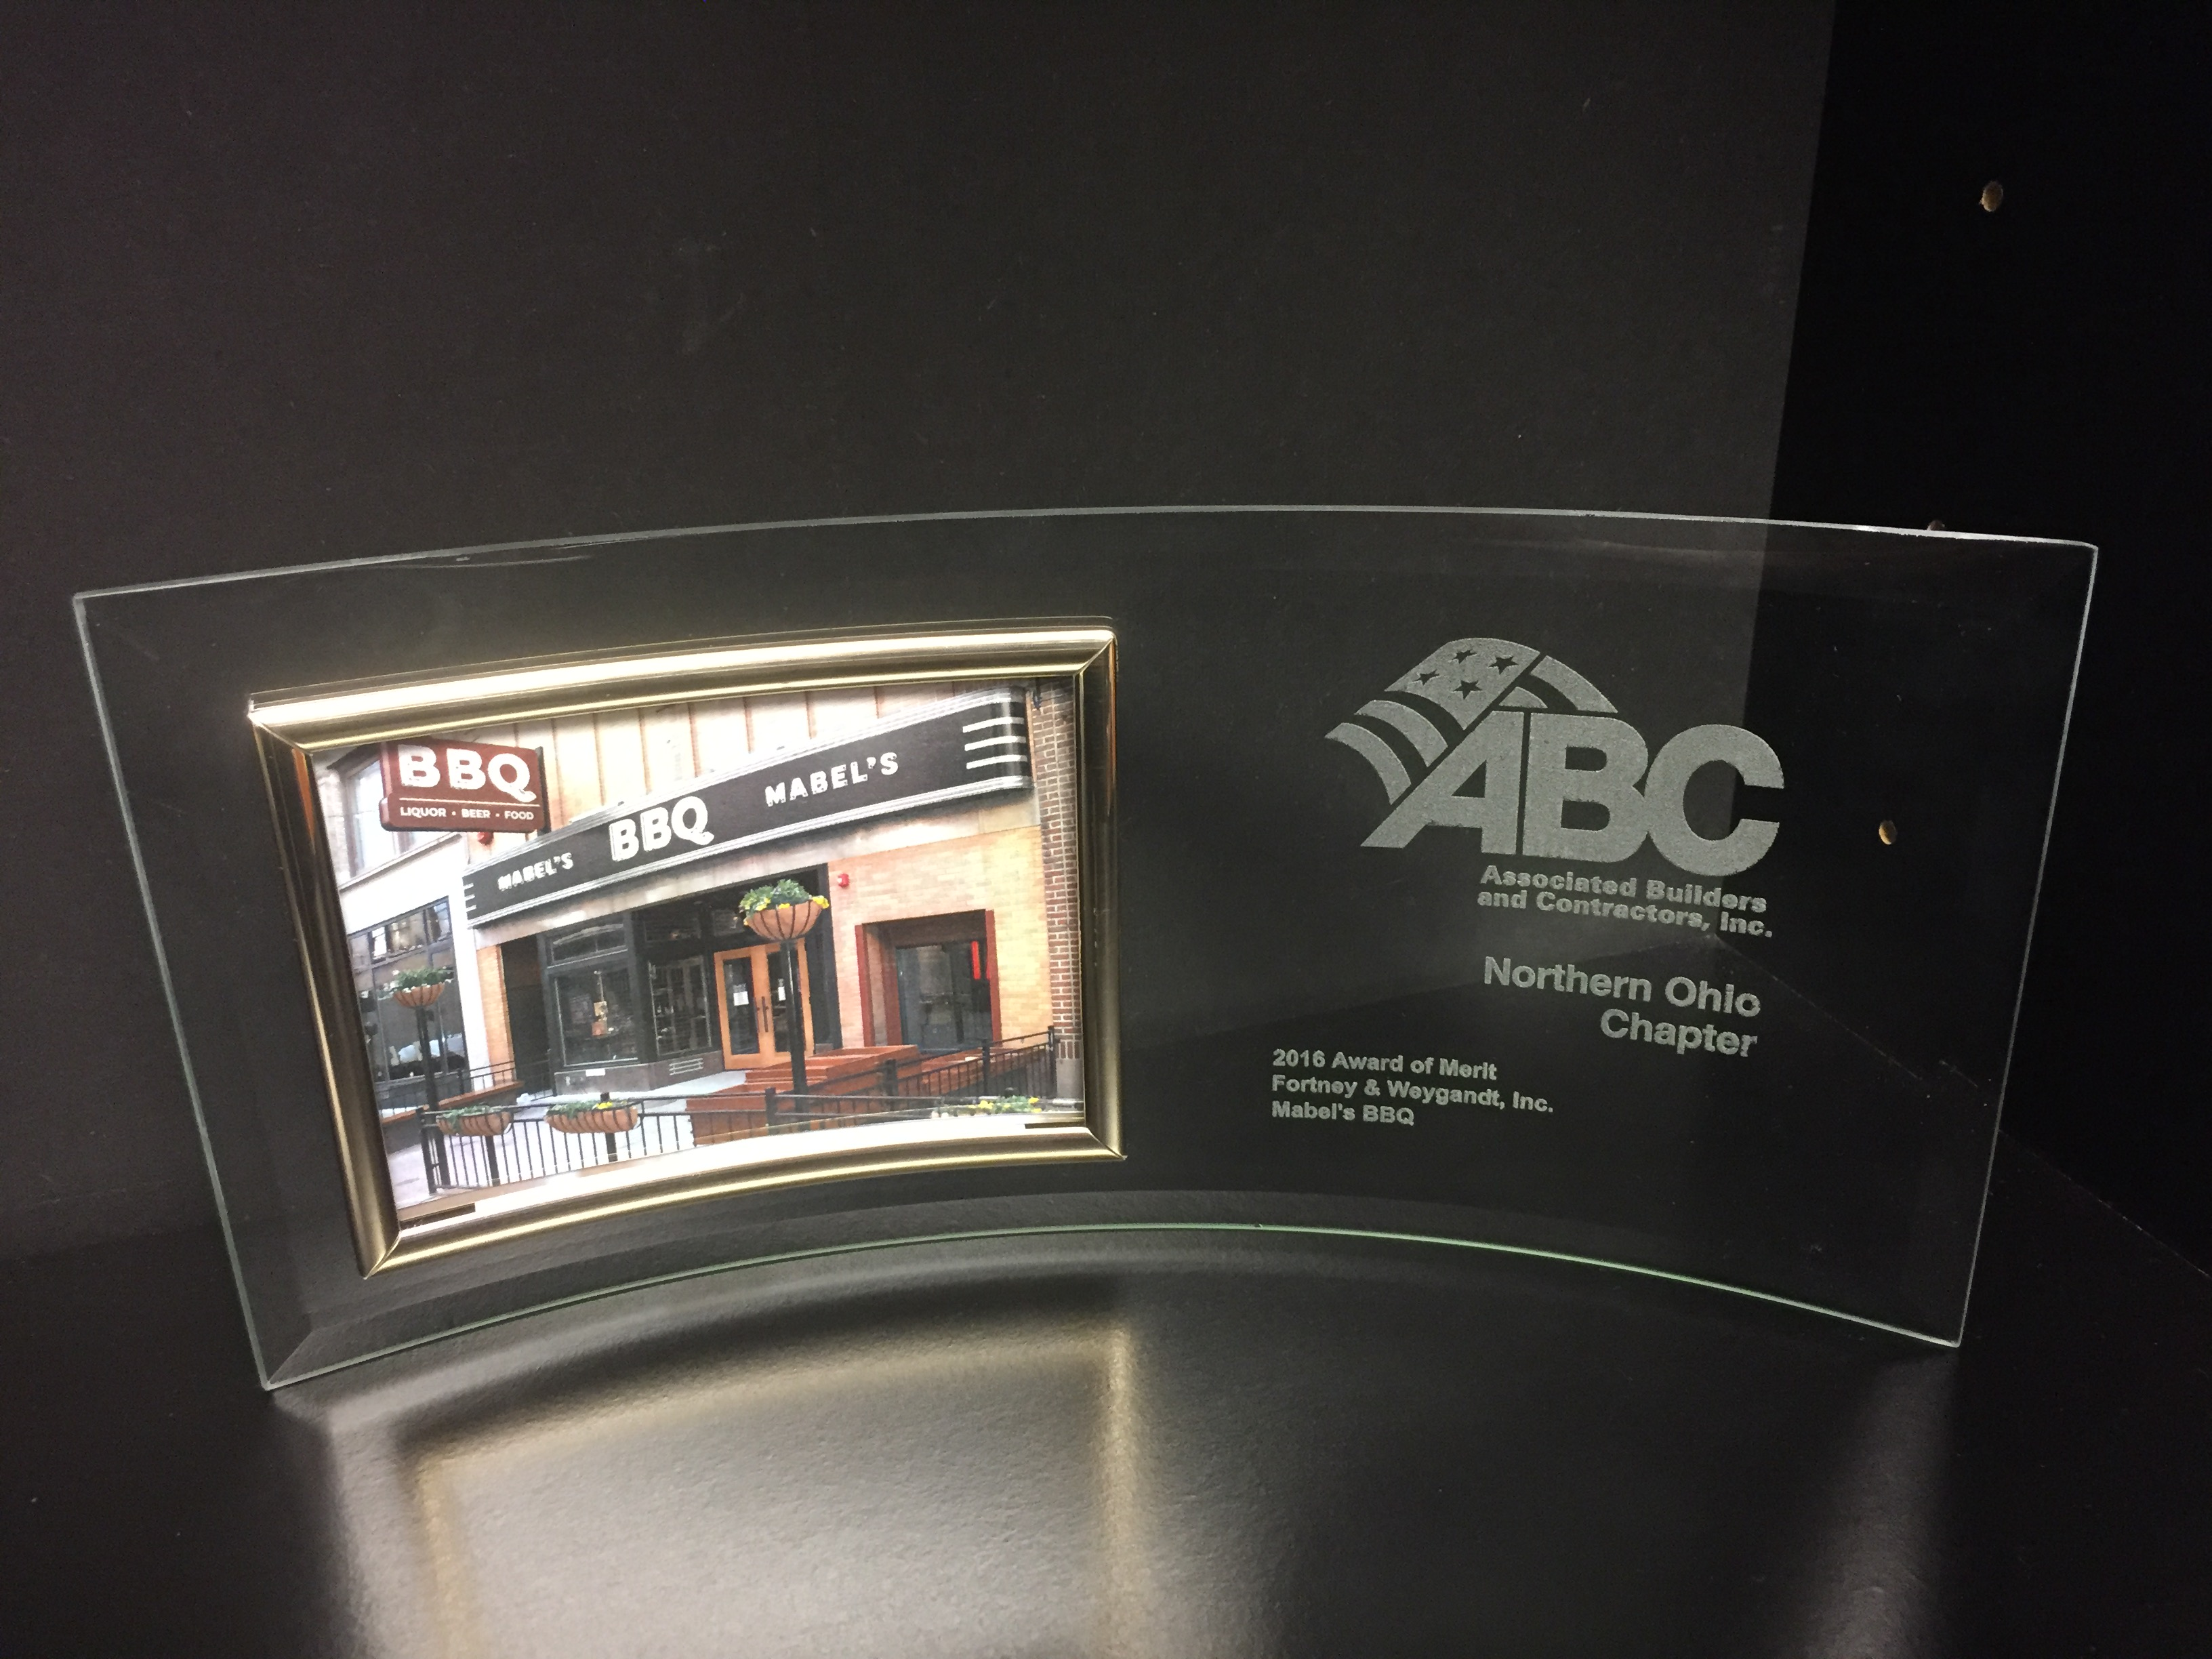 ABC award pic.jpg